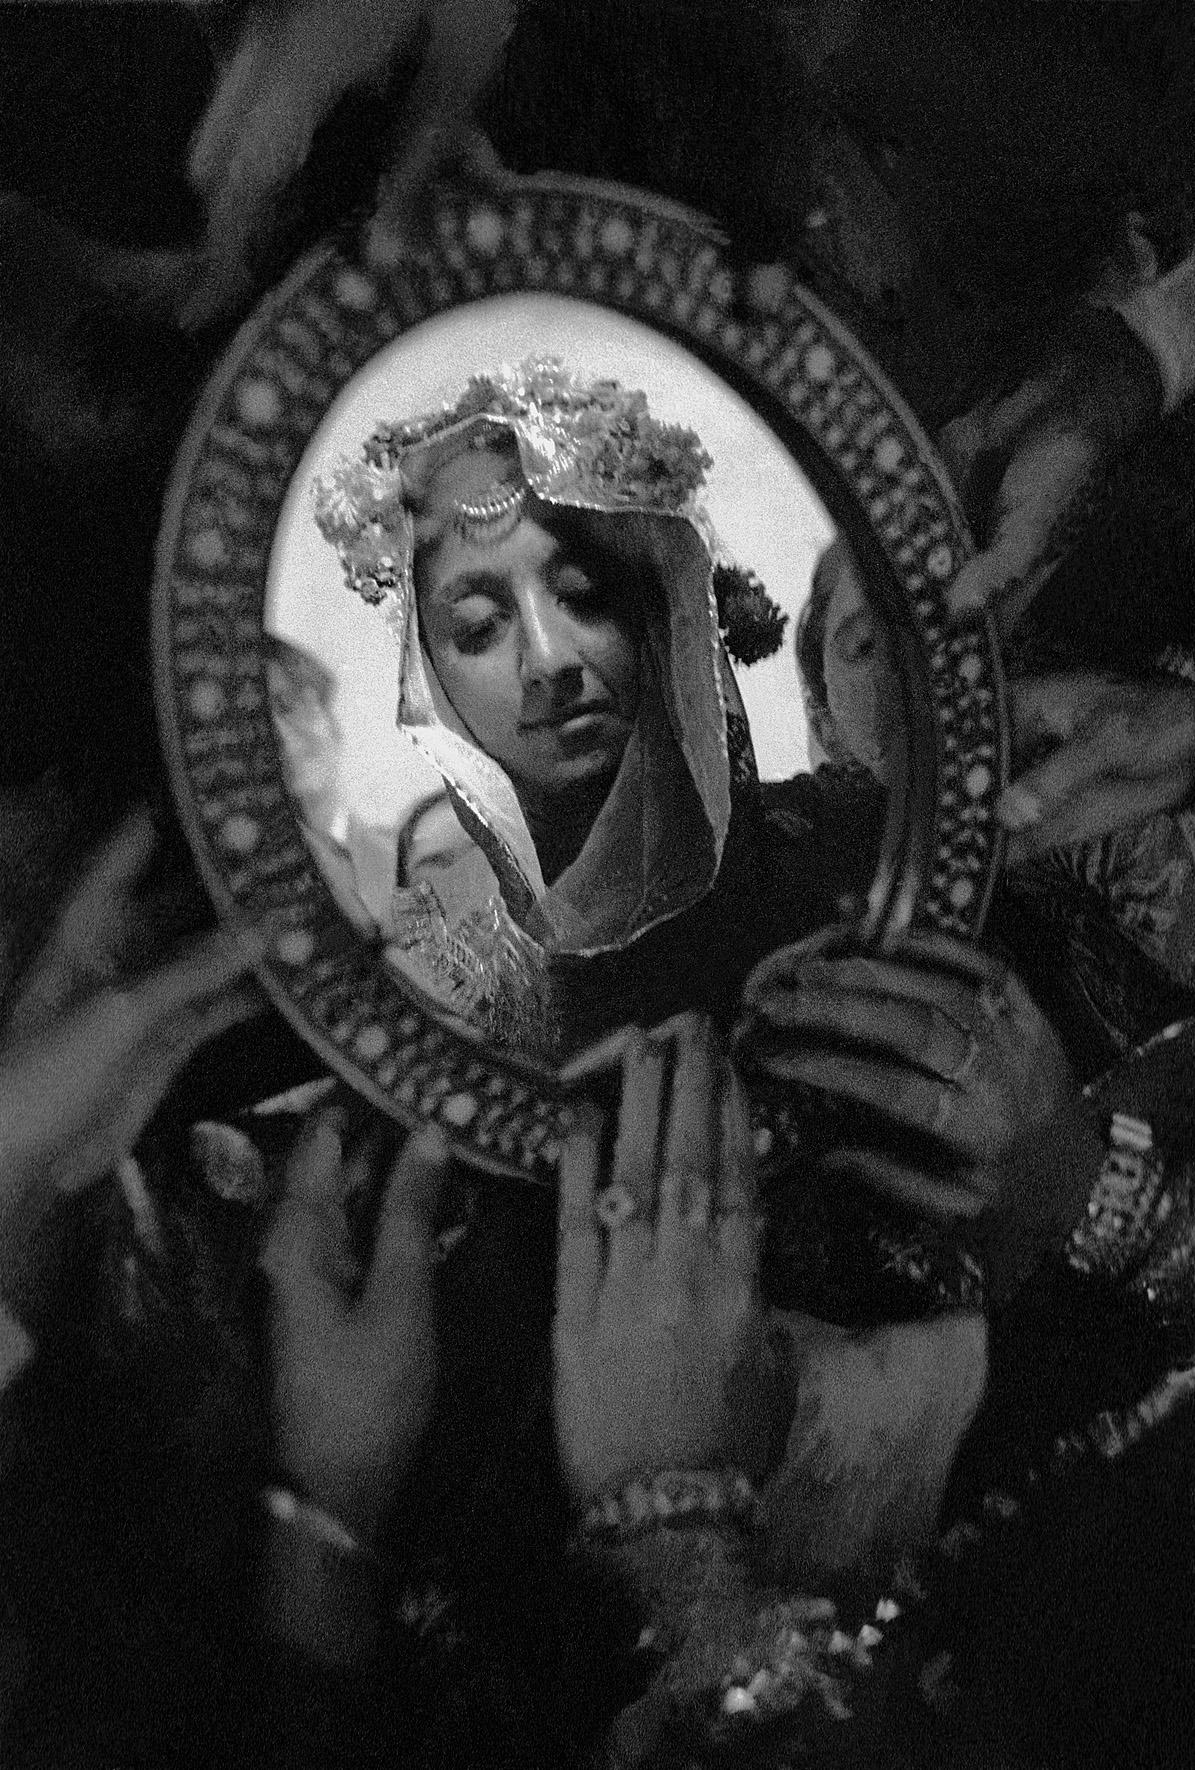 © Frank Horvat – Mohammedan wedding, the bride, Pakistan, 1952, Courtesy KLV Art Projects